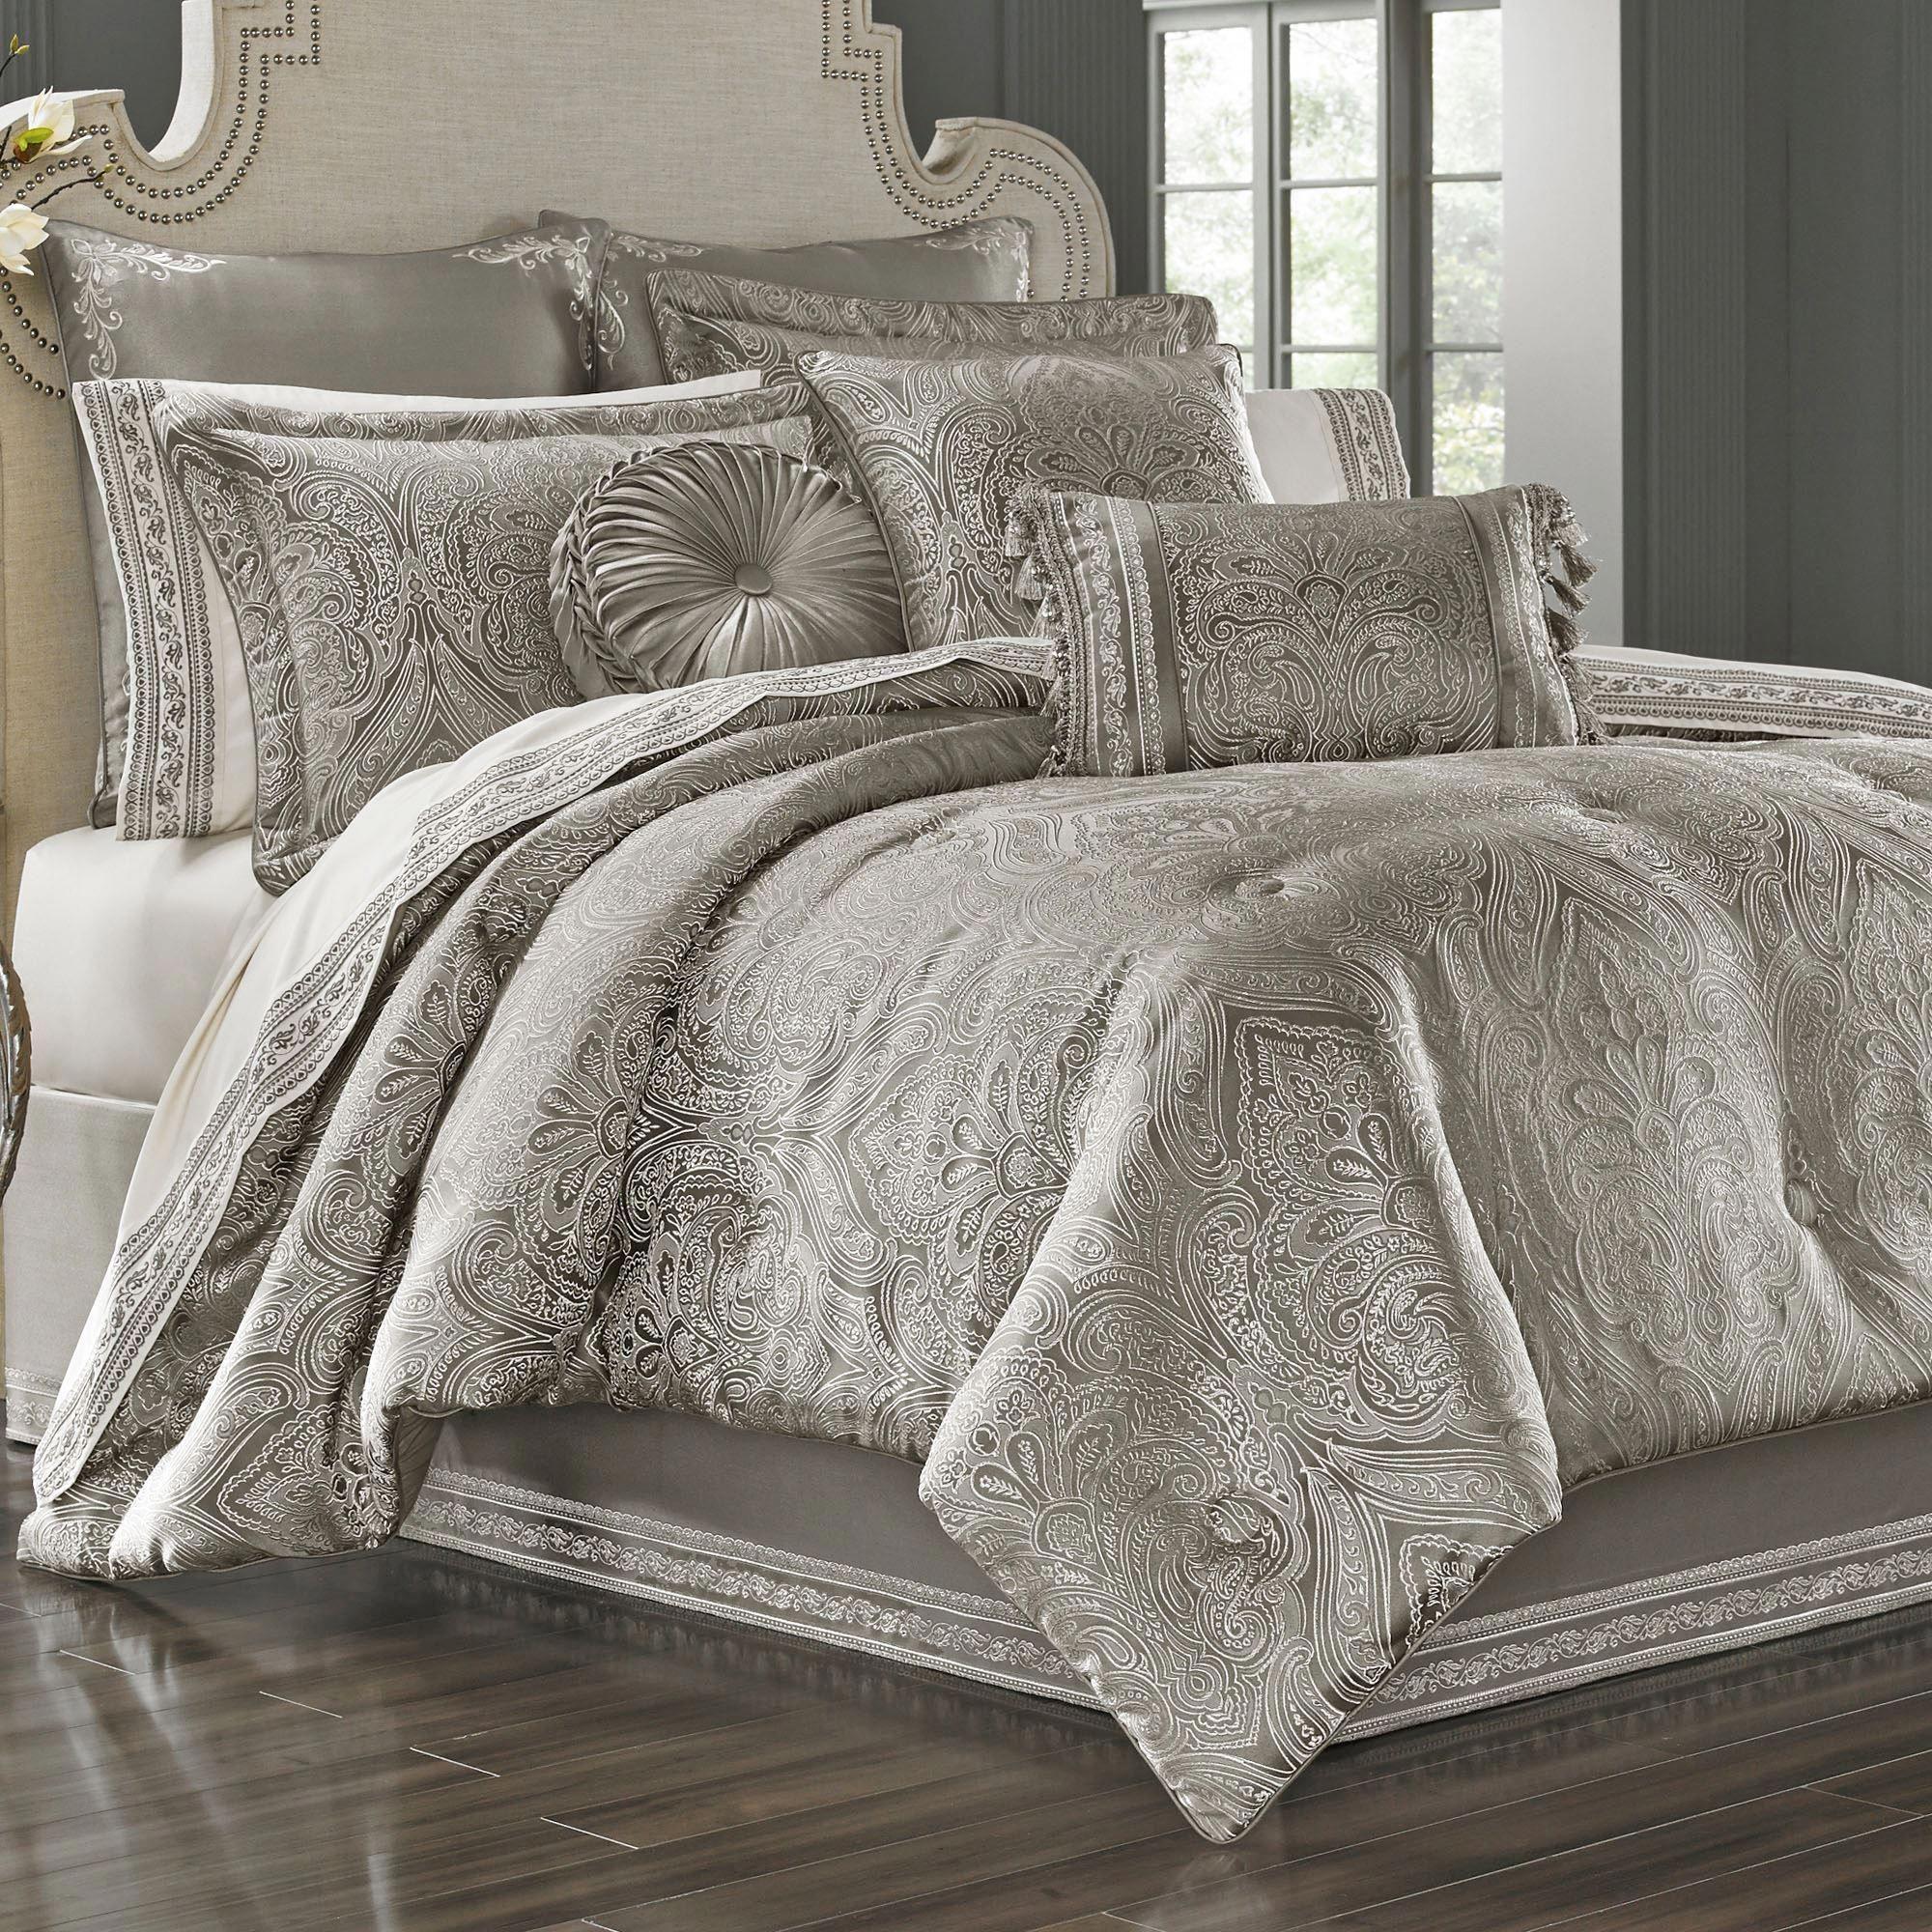 Luxury Bedding Sets For Less #BeautifulBedLinenIdeas